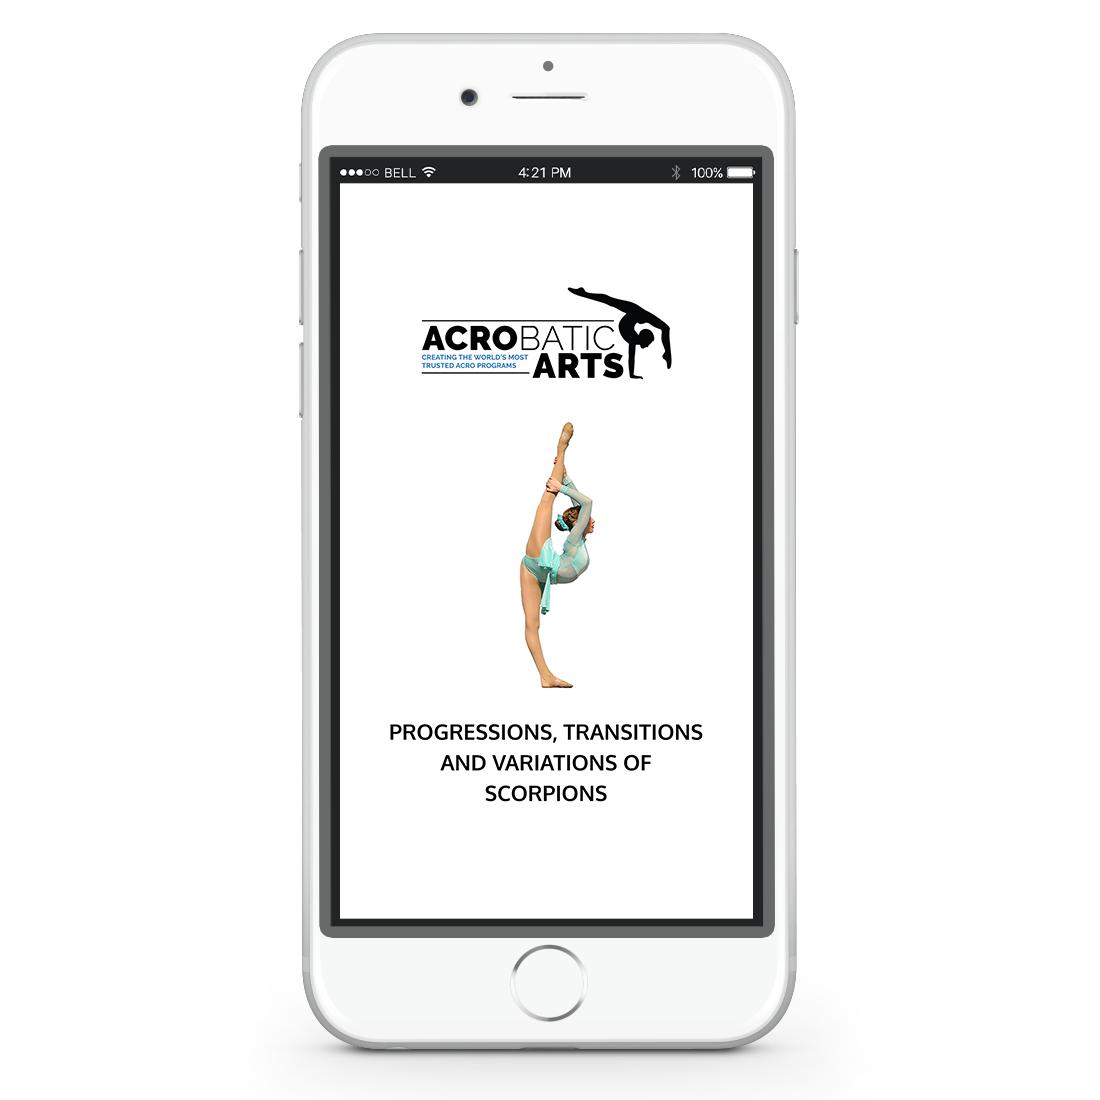 Acrobatic Arts - Website Promo.png